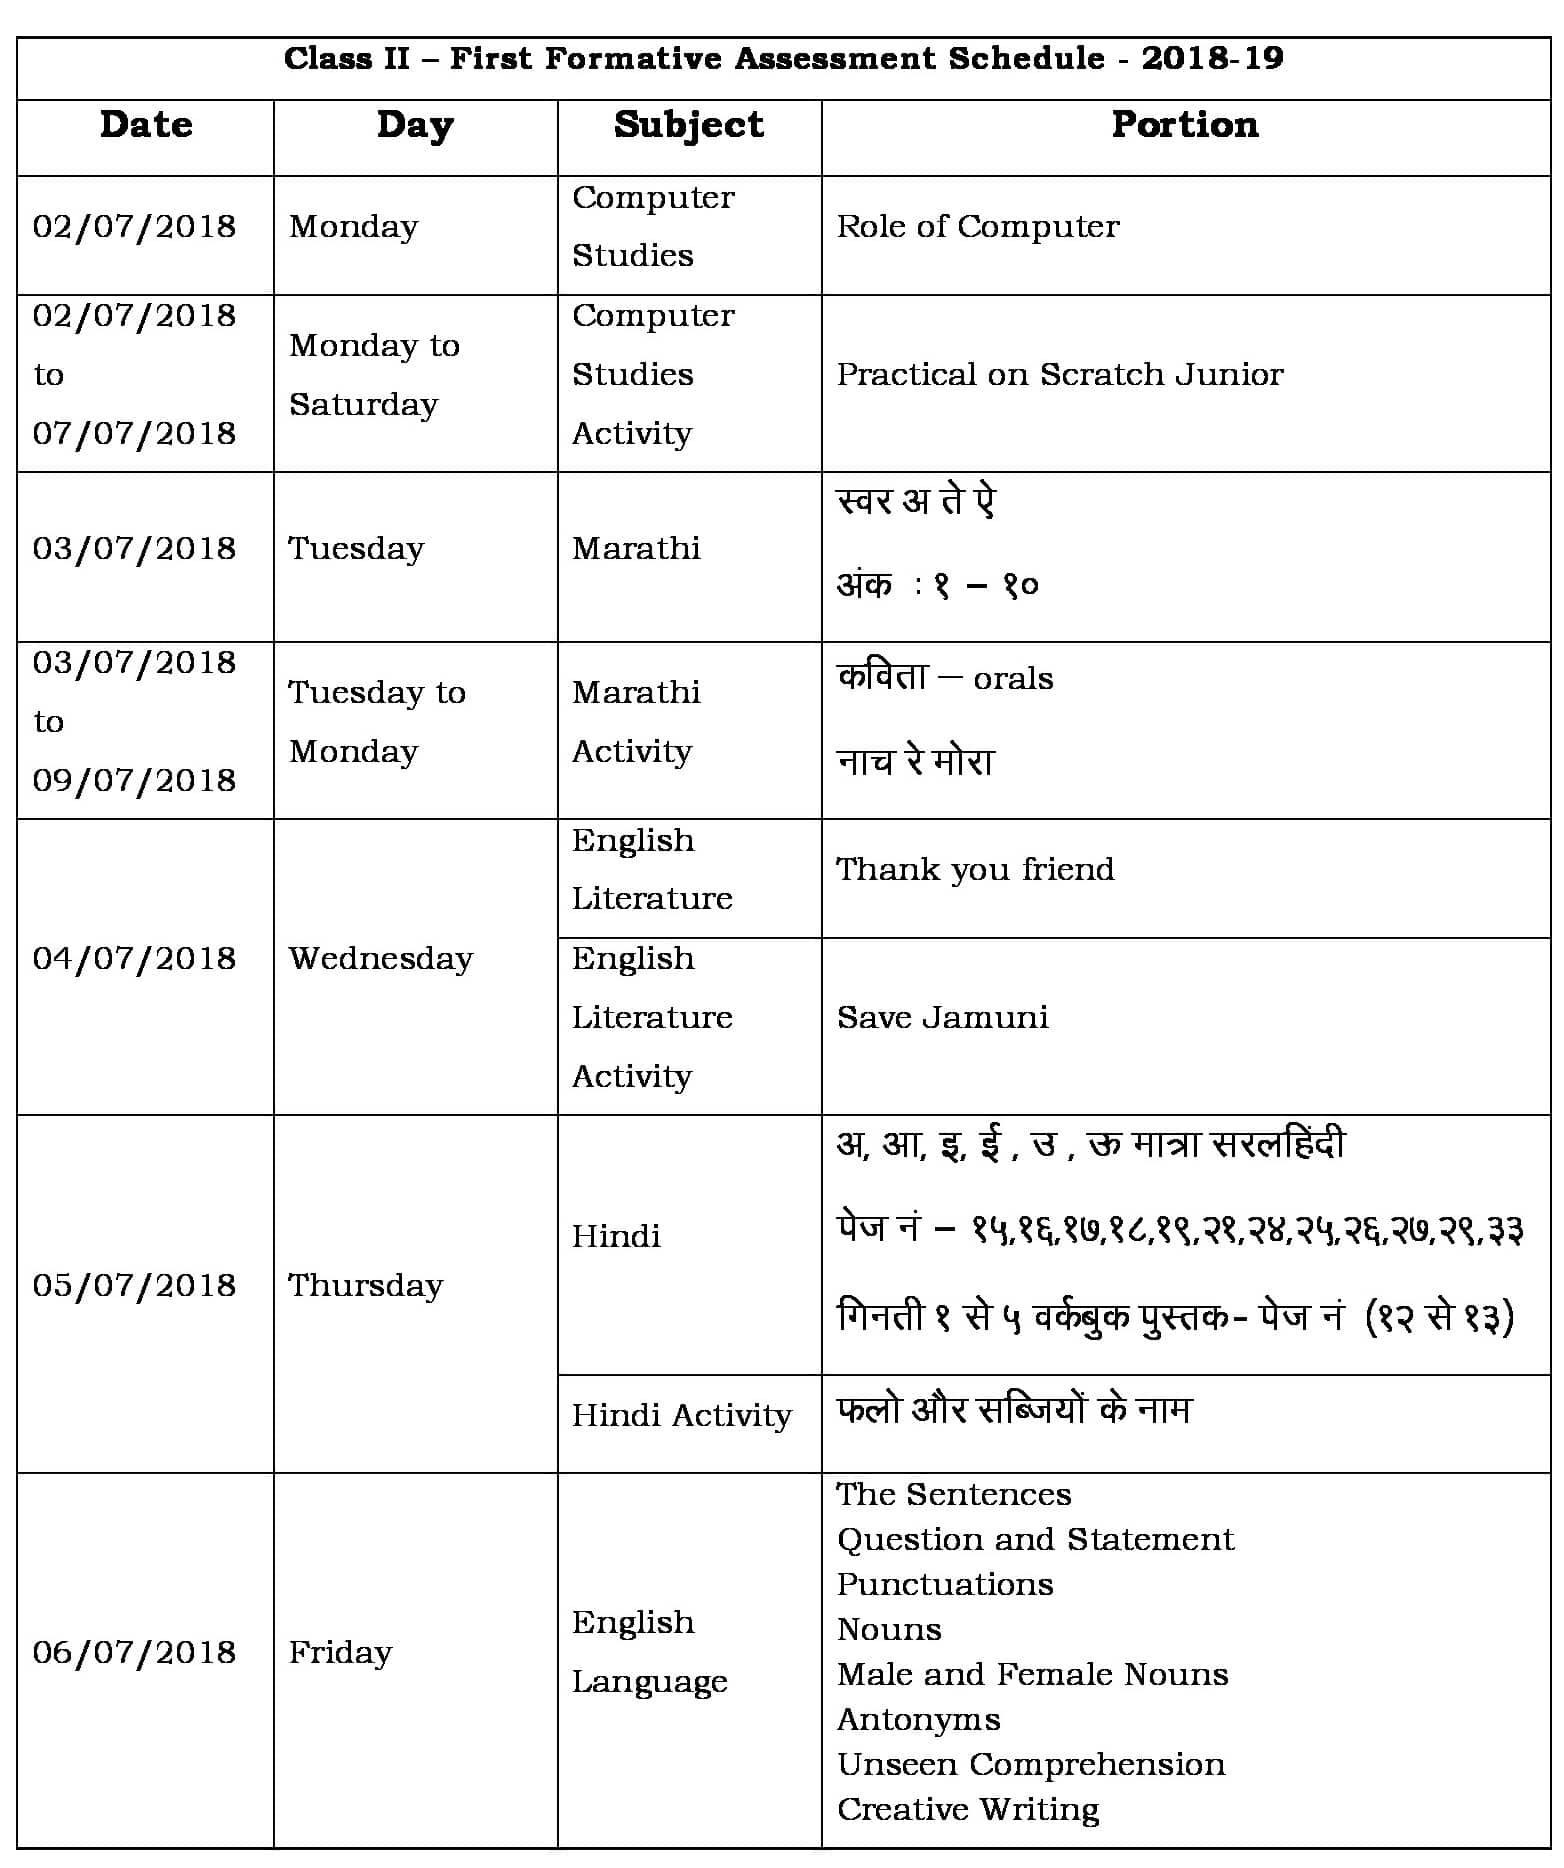 FA 1 Portion & Schedule 2018-19